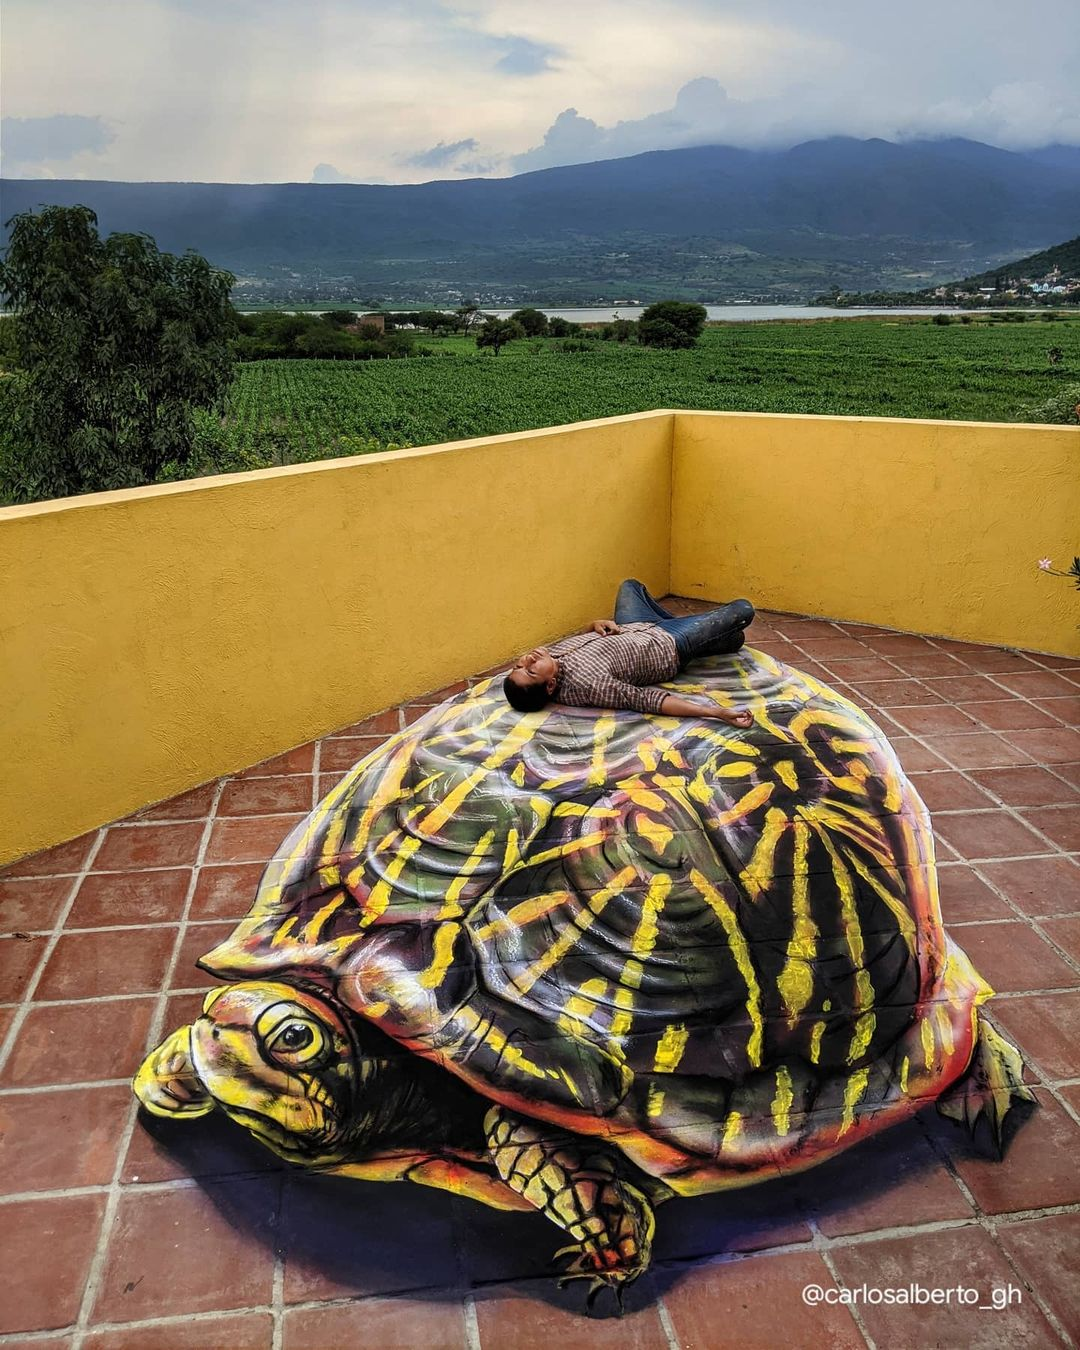 tortuga arte anamorfico carlos alberto gh